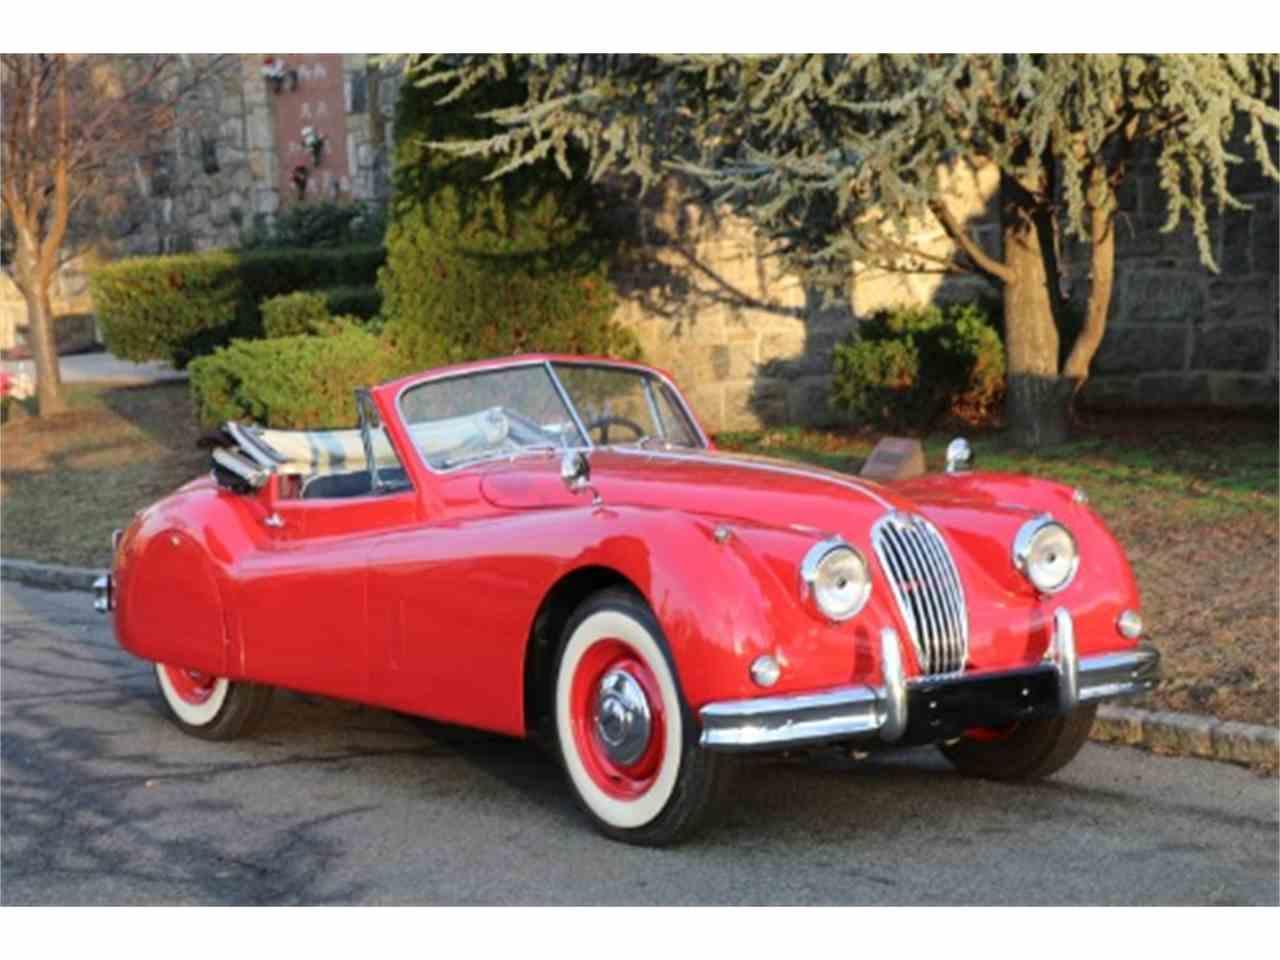 s jaguar report img d car auto world concours angeles sale annual la in los delegance it photo elegance your for